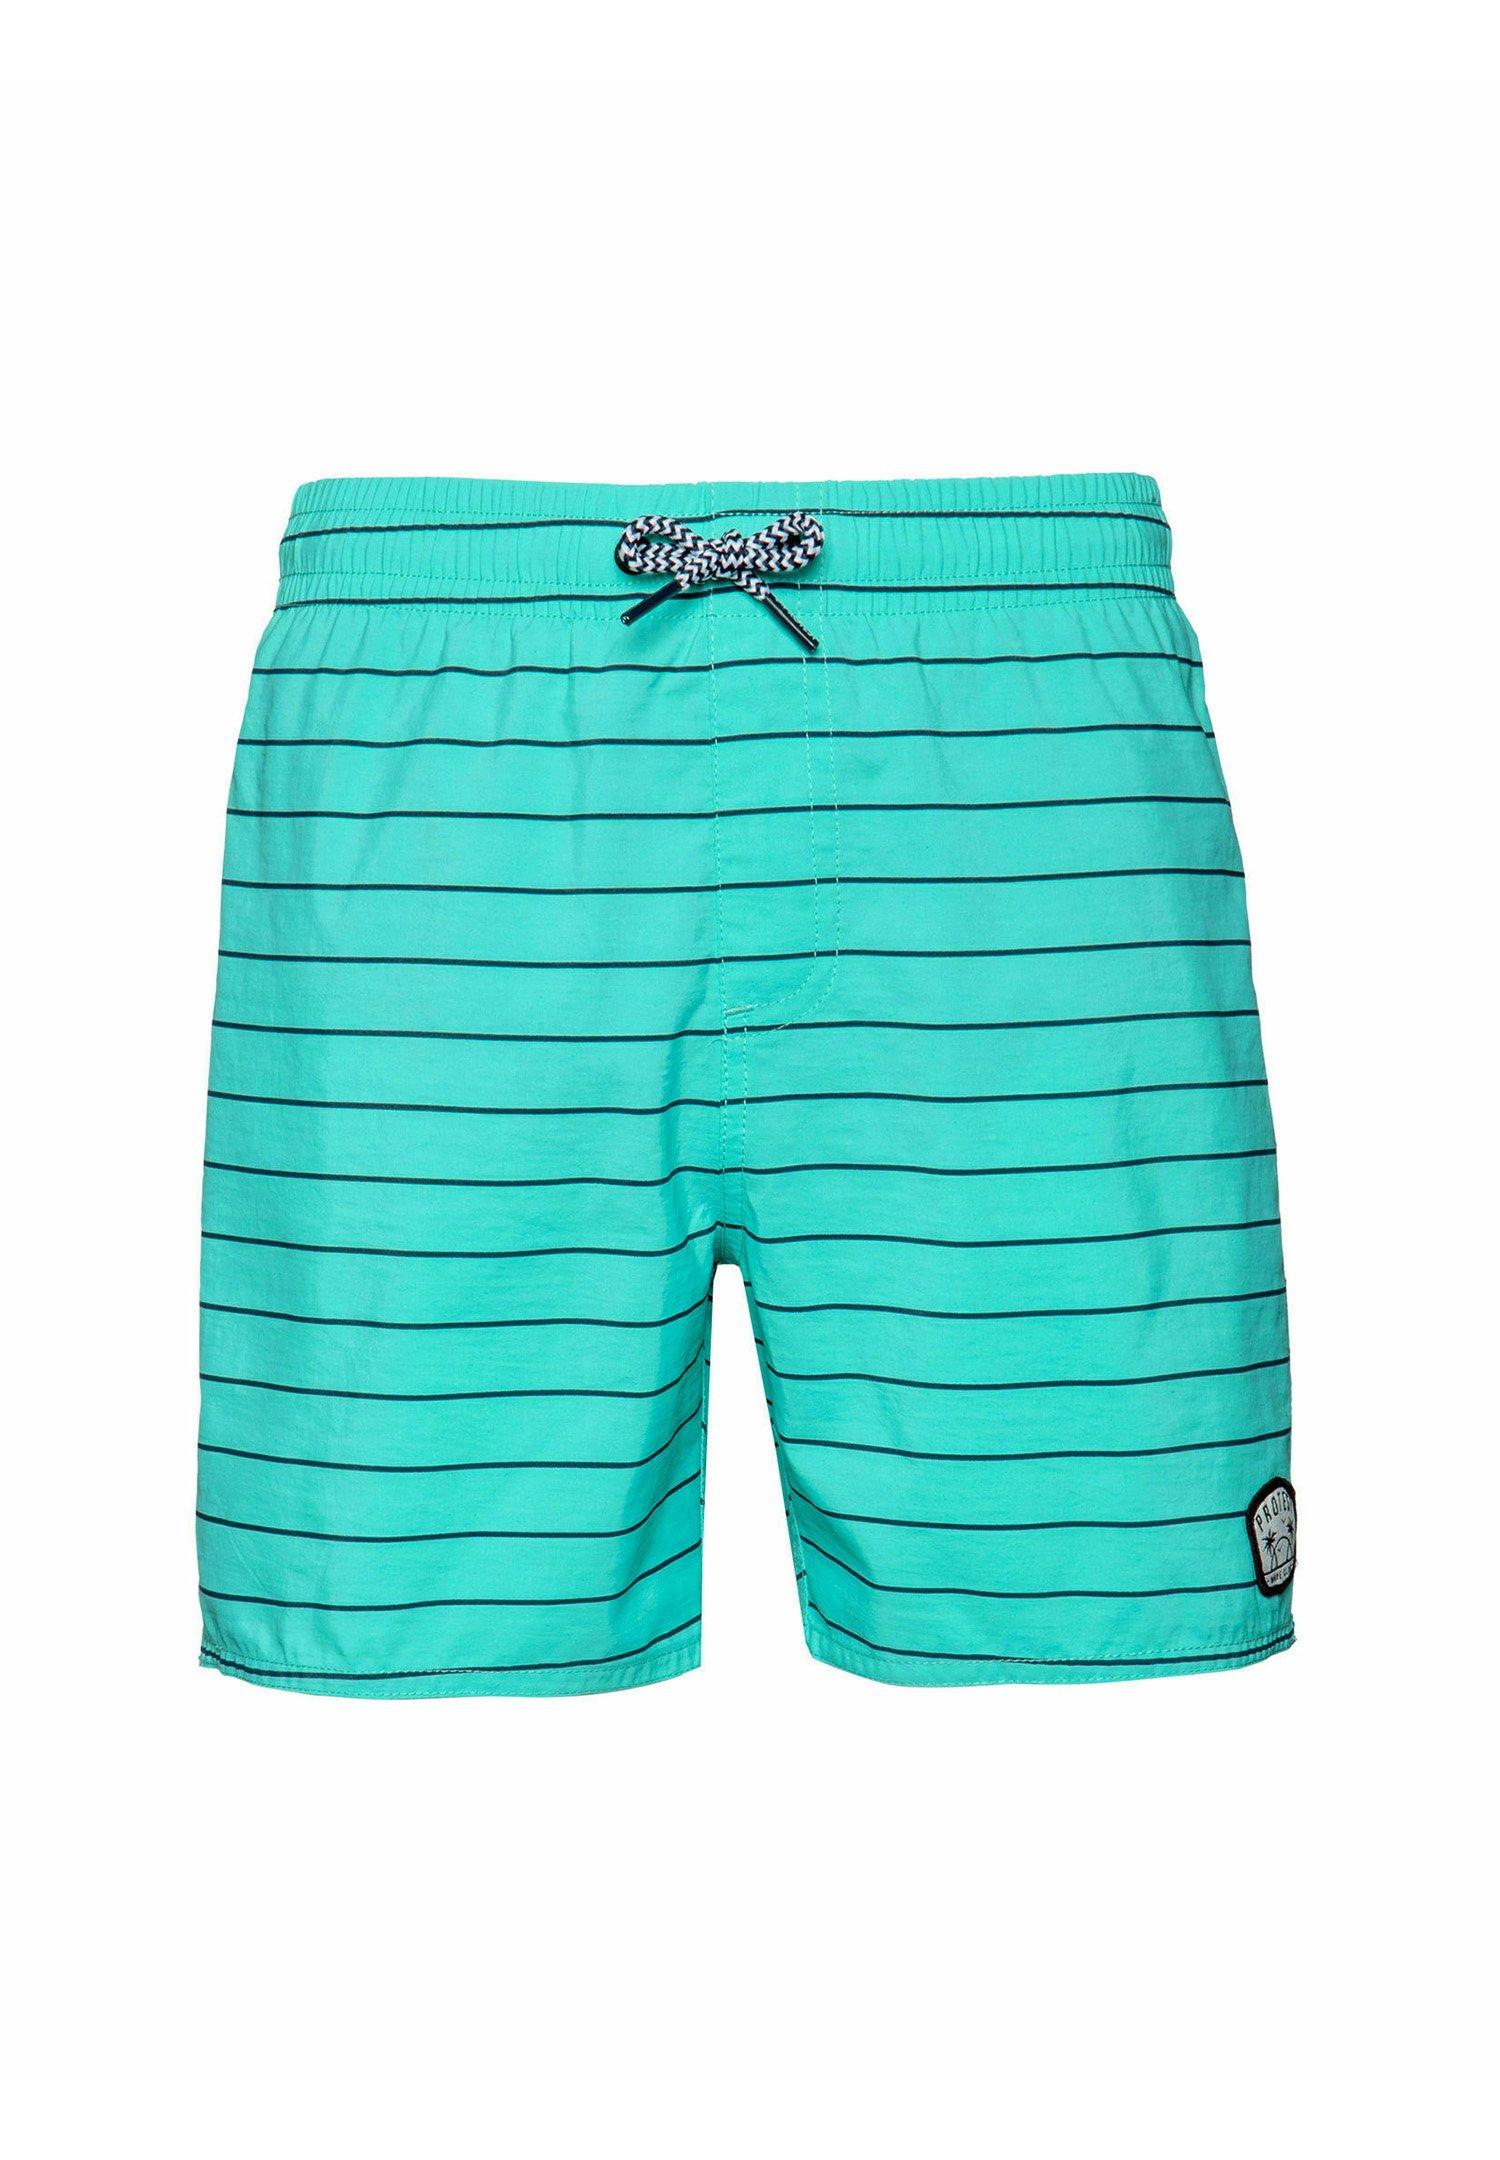 Kinder BJORN 21 JR - Badehose Pants